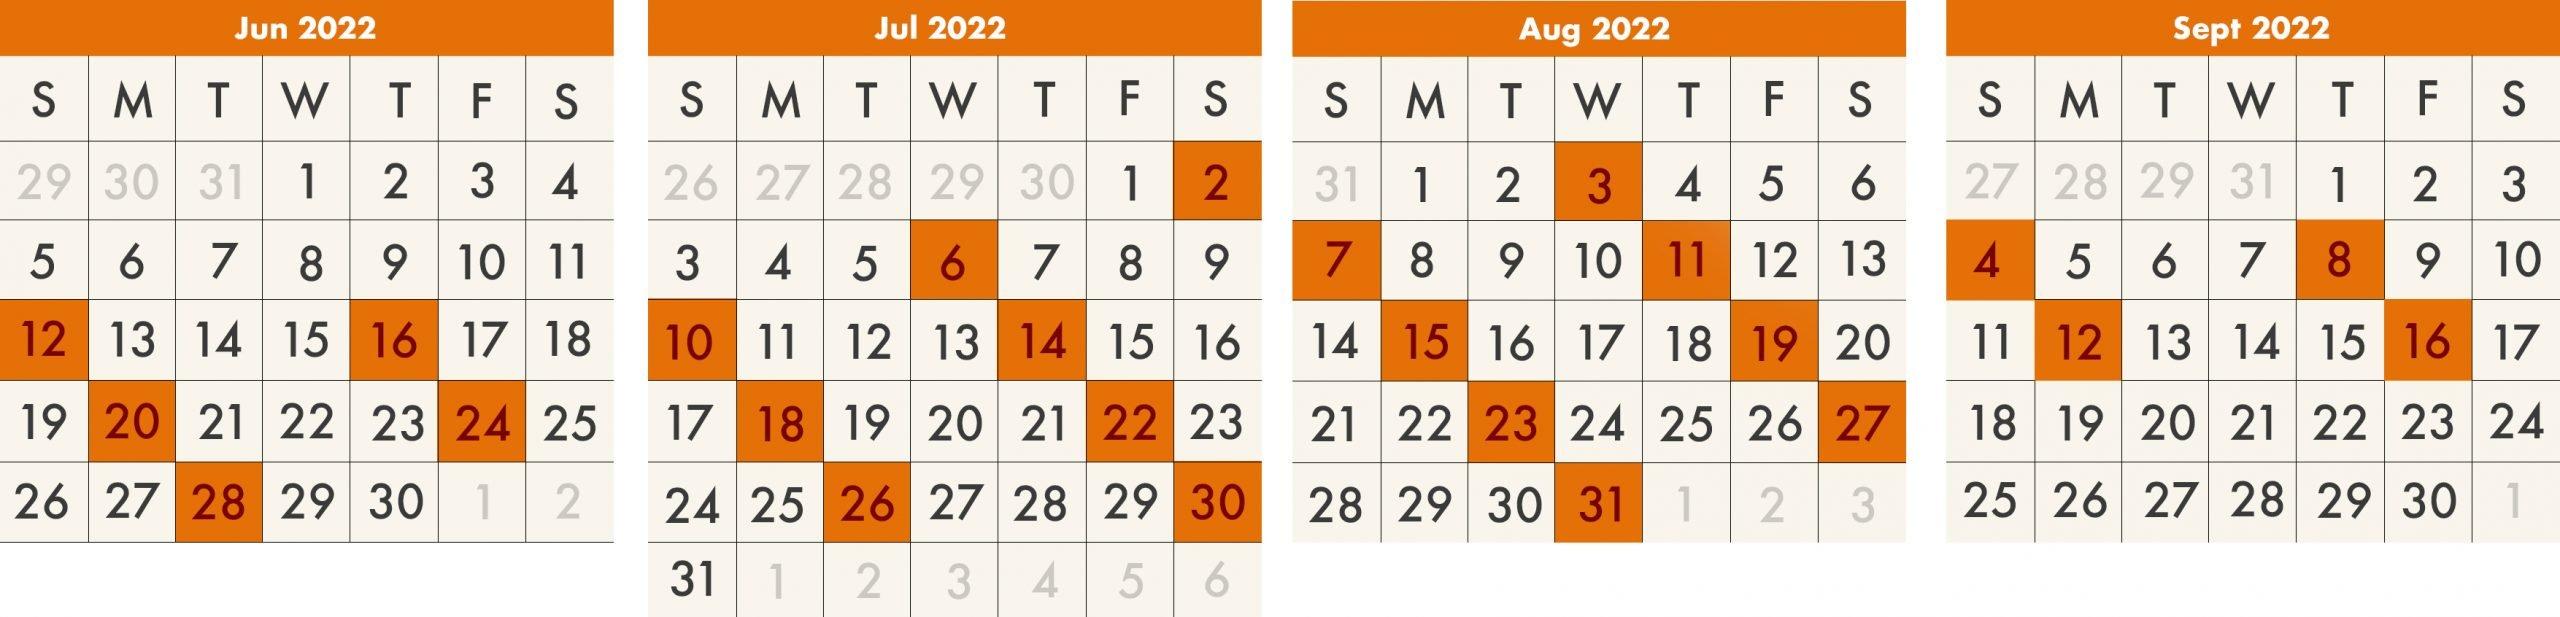 Dates and Calendar